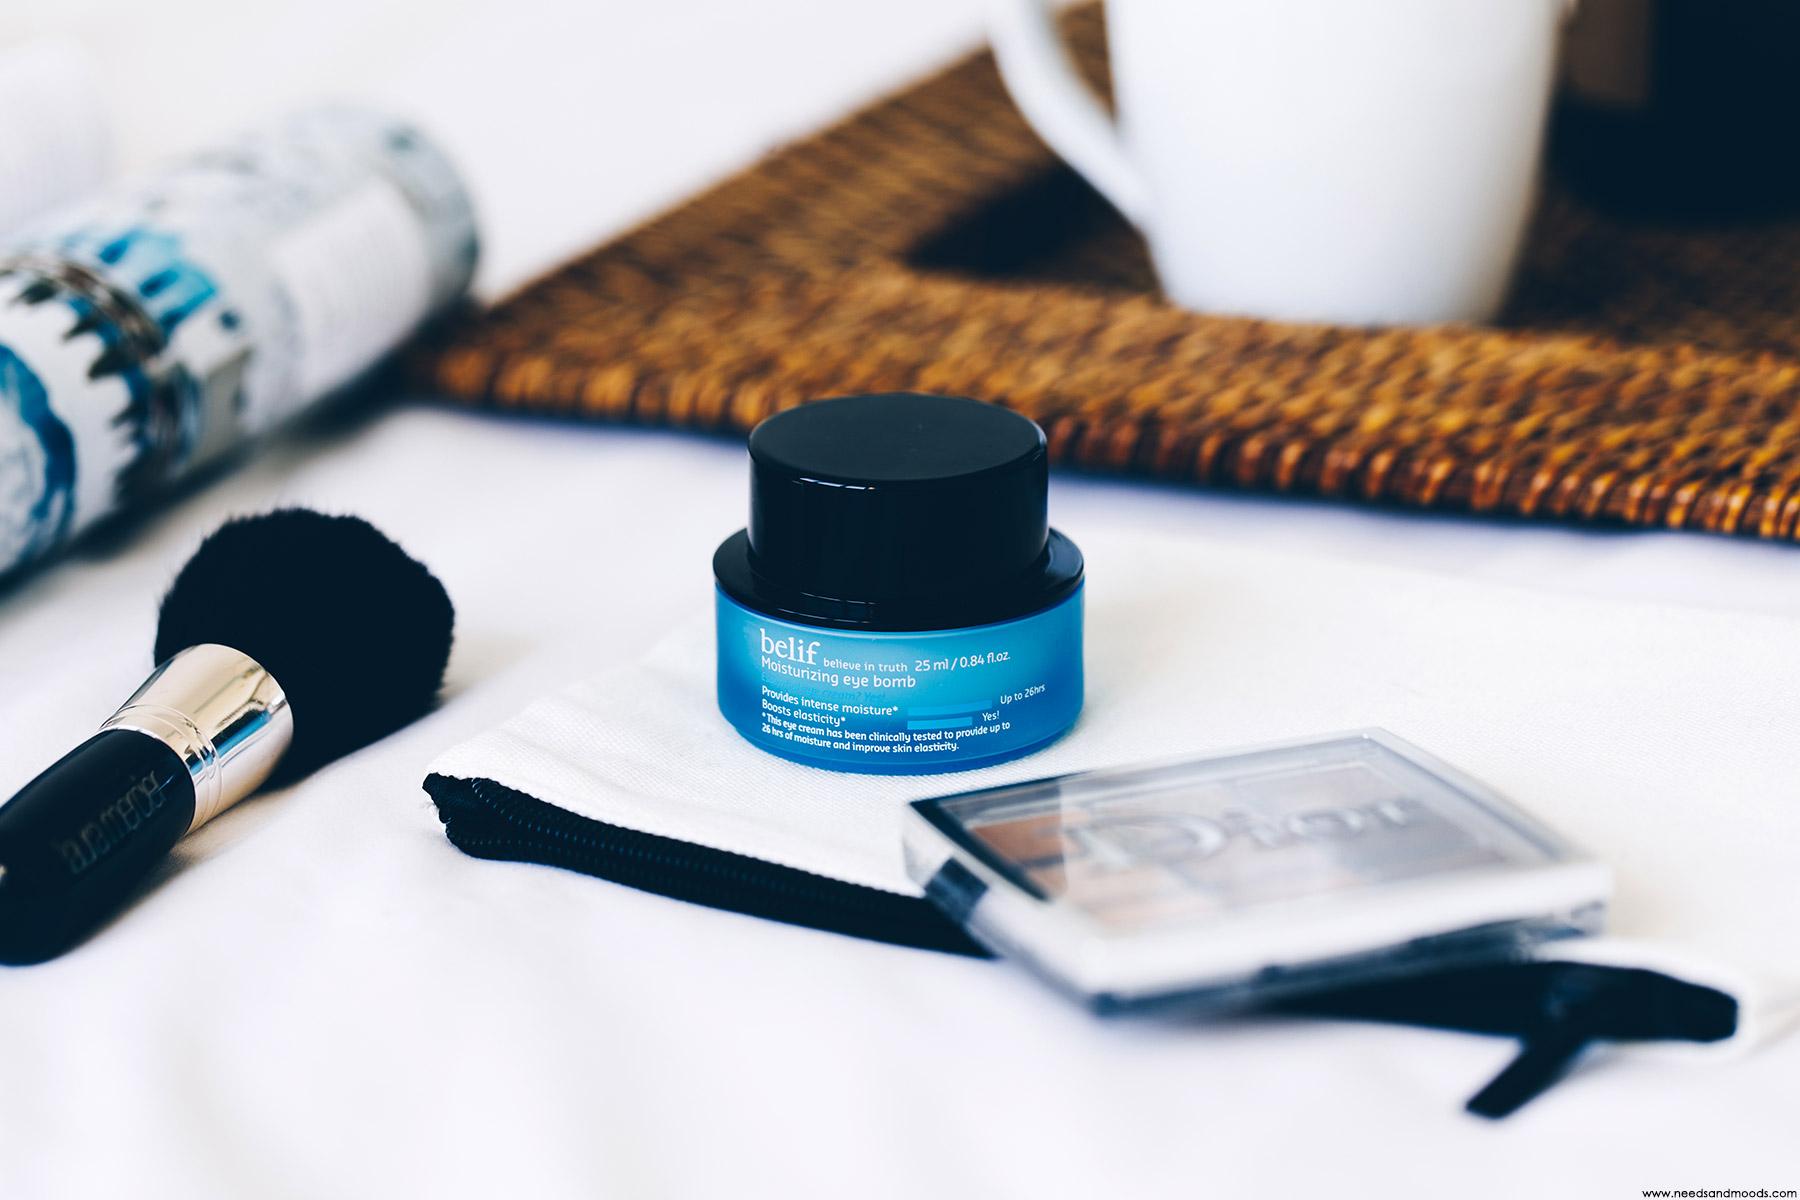 moisturizing eye bomb